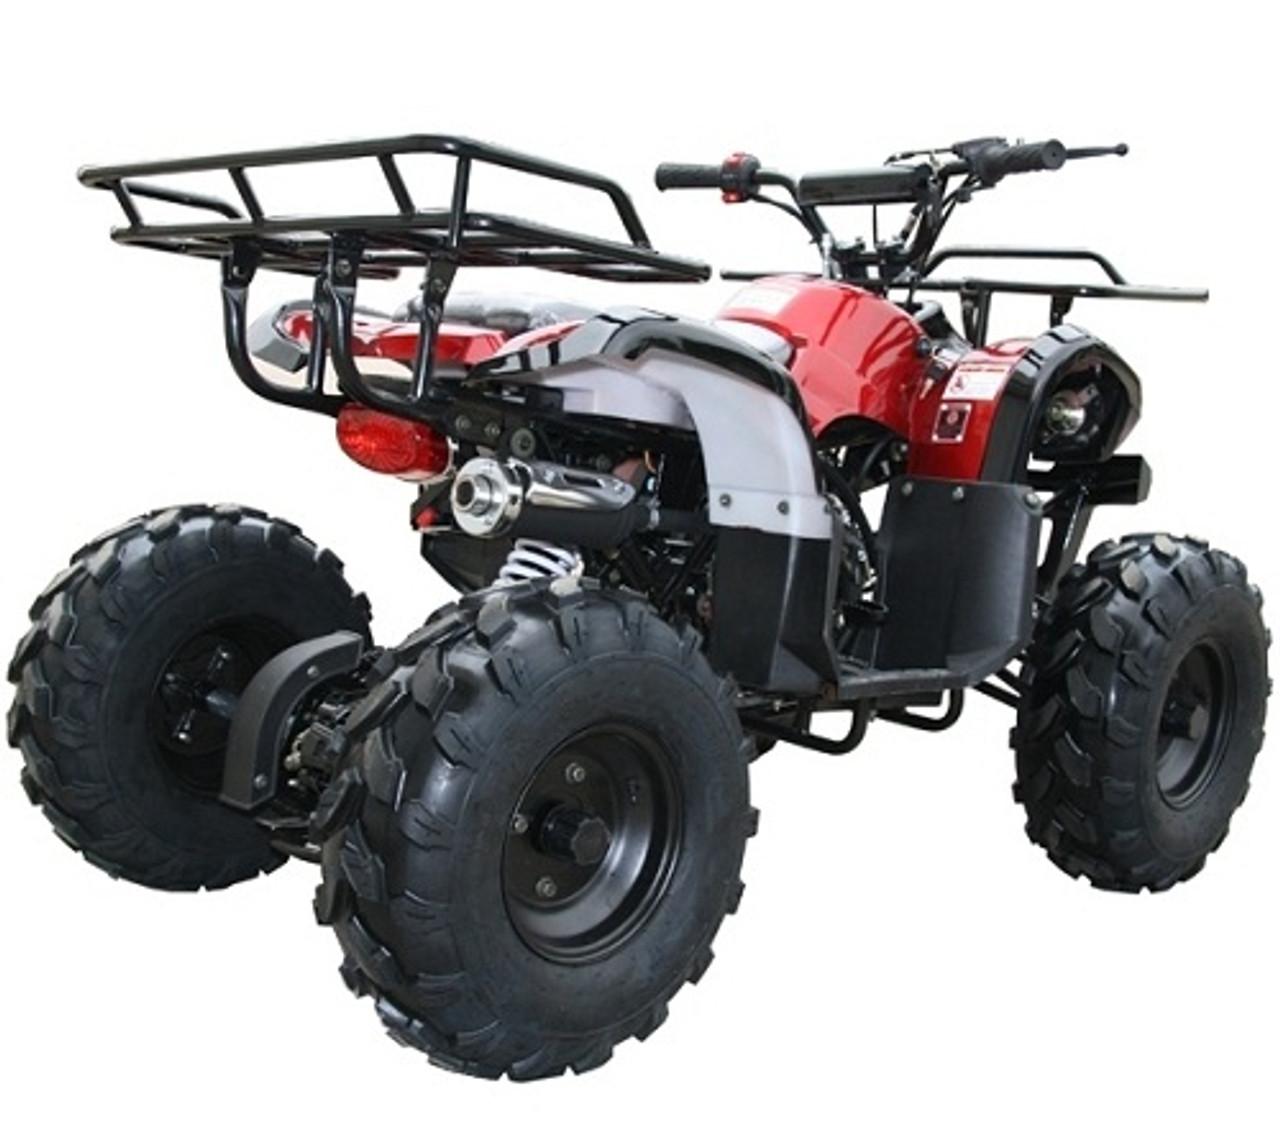 Coolster Plastic Body 110 125 cc ATV 3050D 3125R 3125XR8-U 3125XR8-US Red Spider